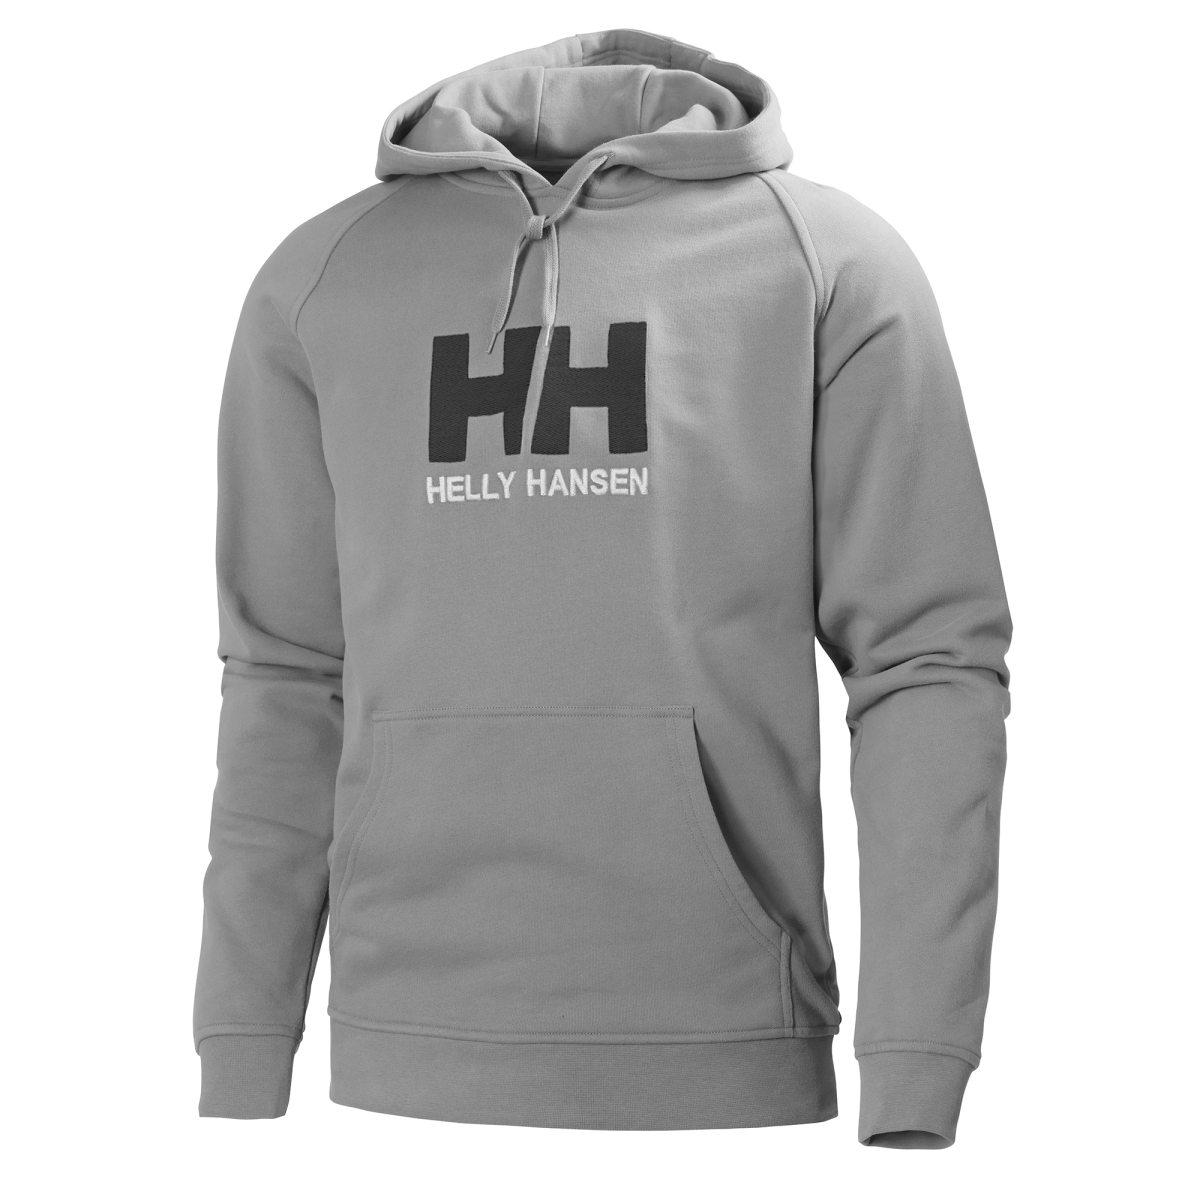 26a9623b Find hh hustad jakke herre grå. Shop every store on the internet via ...